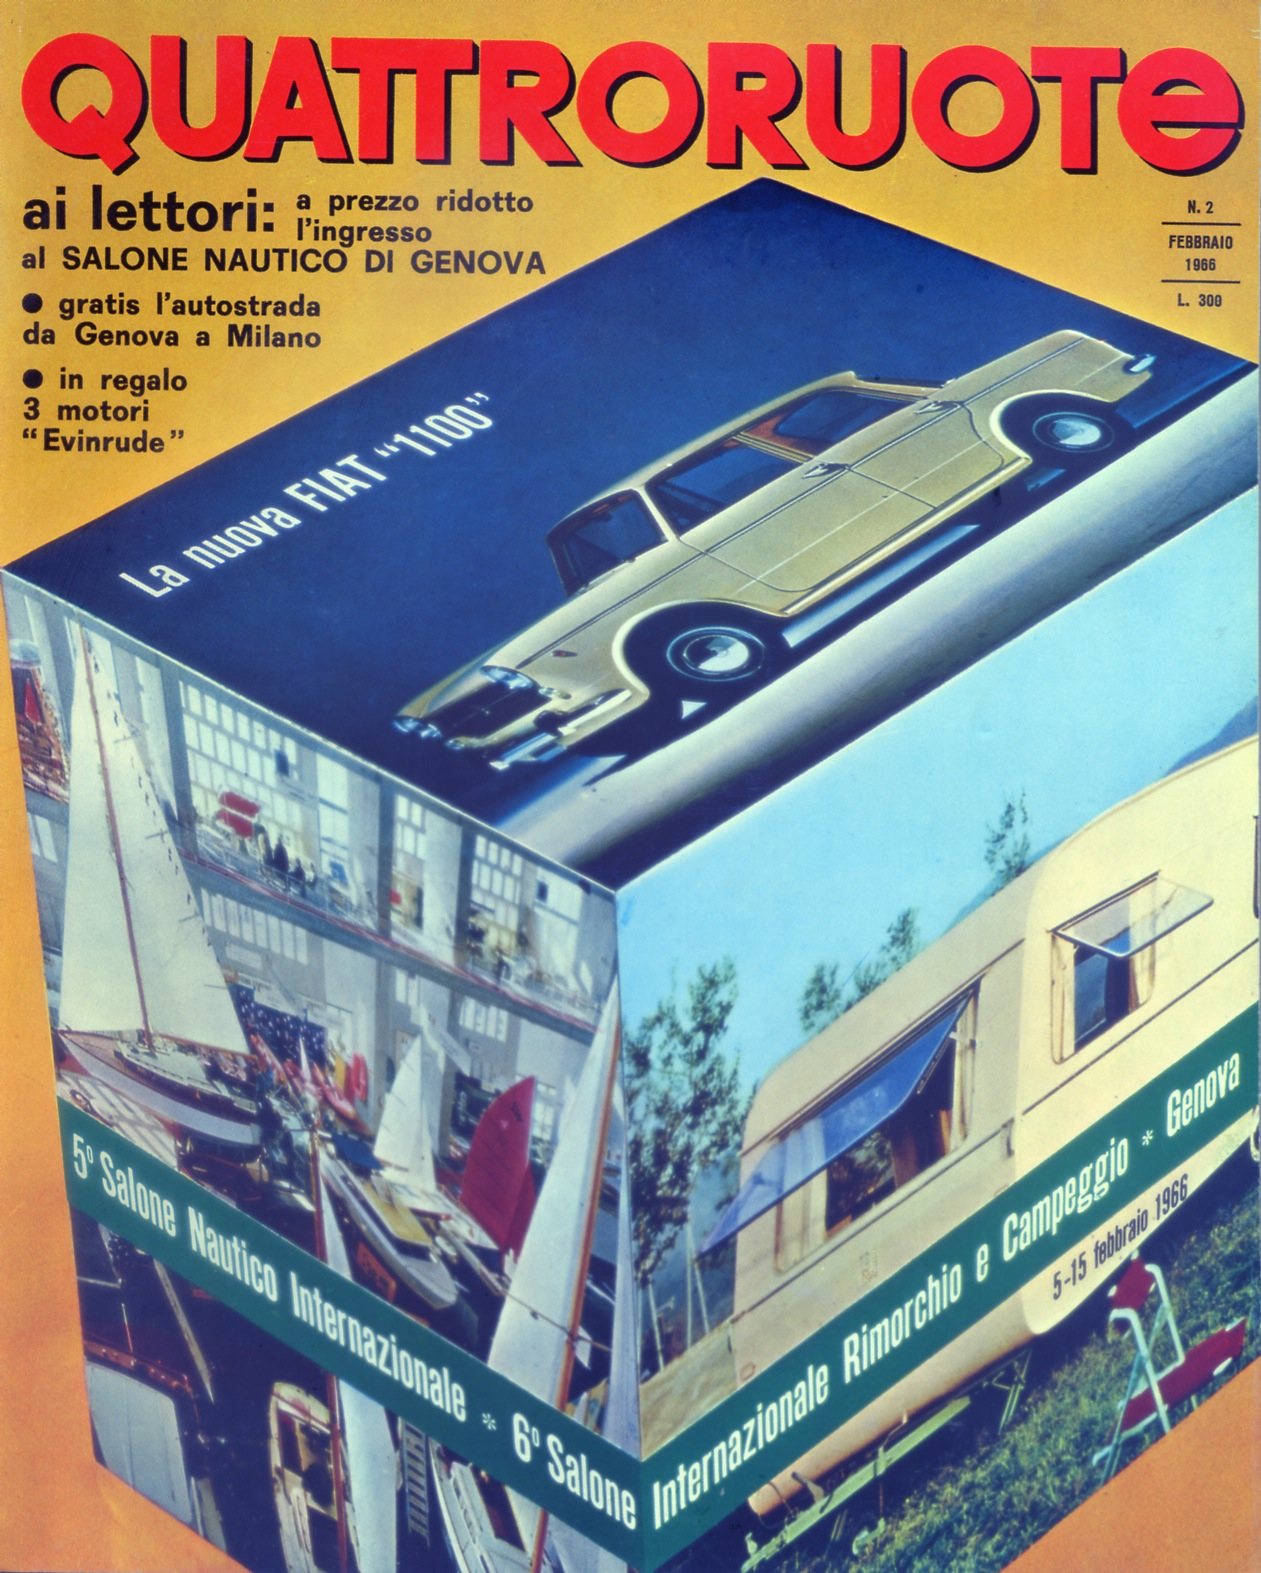 1966 quattroruote copertina febbraio 122